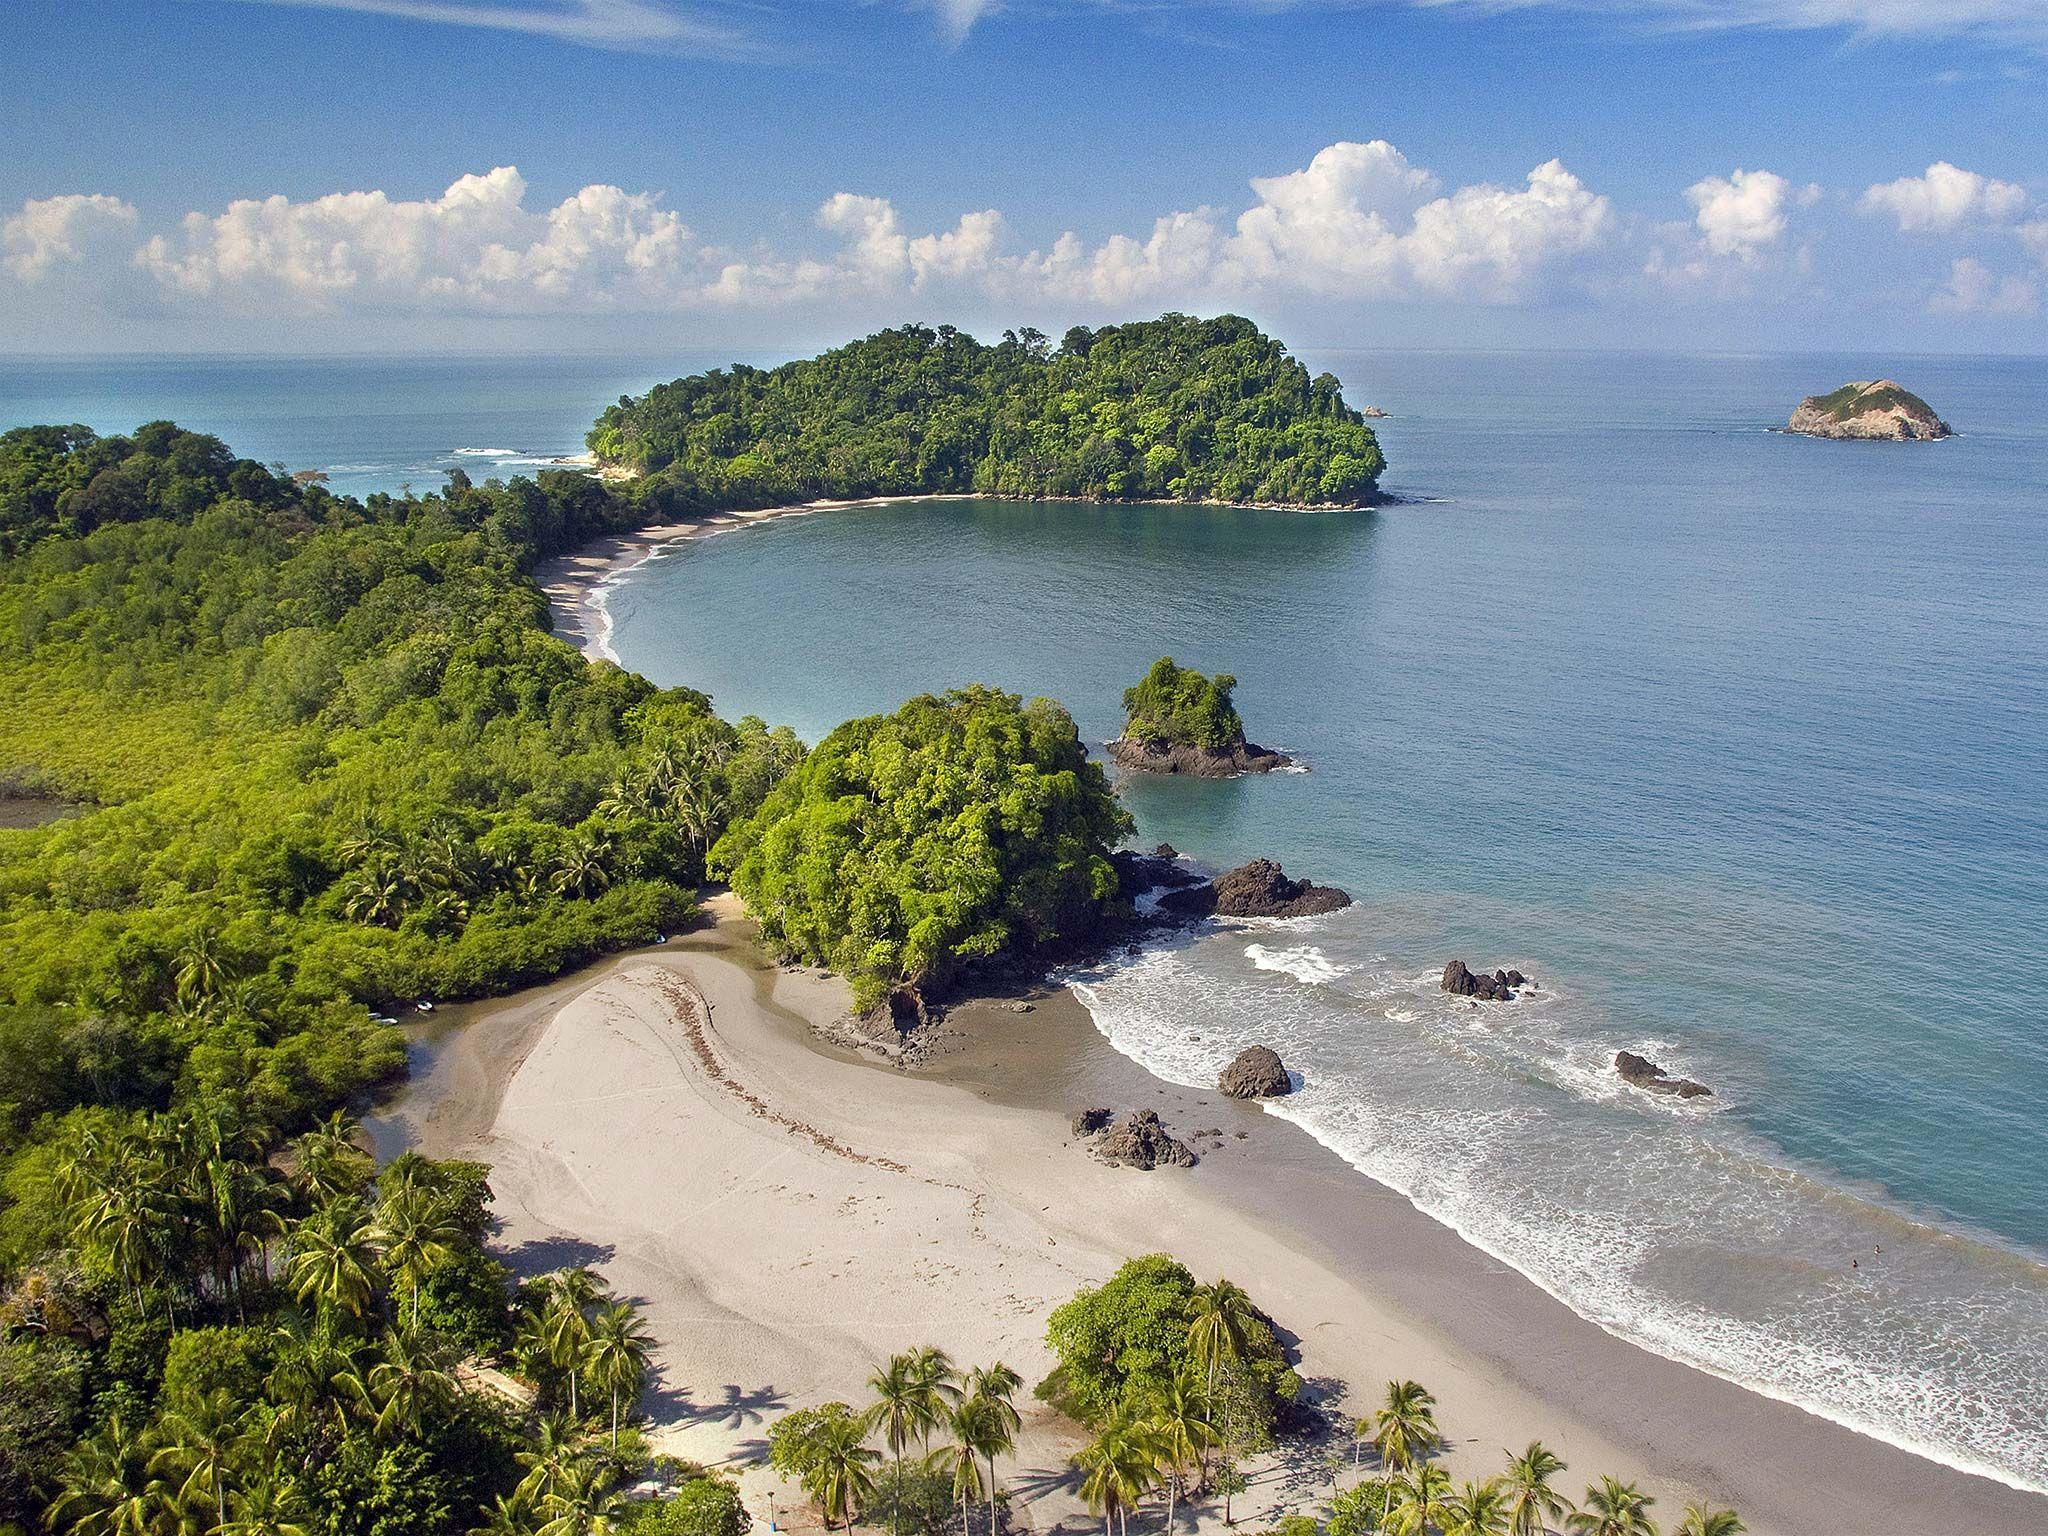 avventure-in-moto_costarica-travel-adventure-trip-07